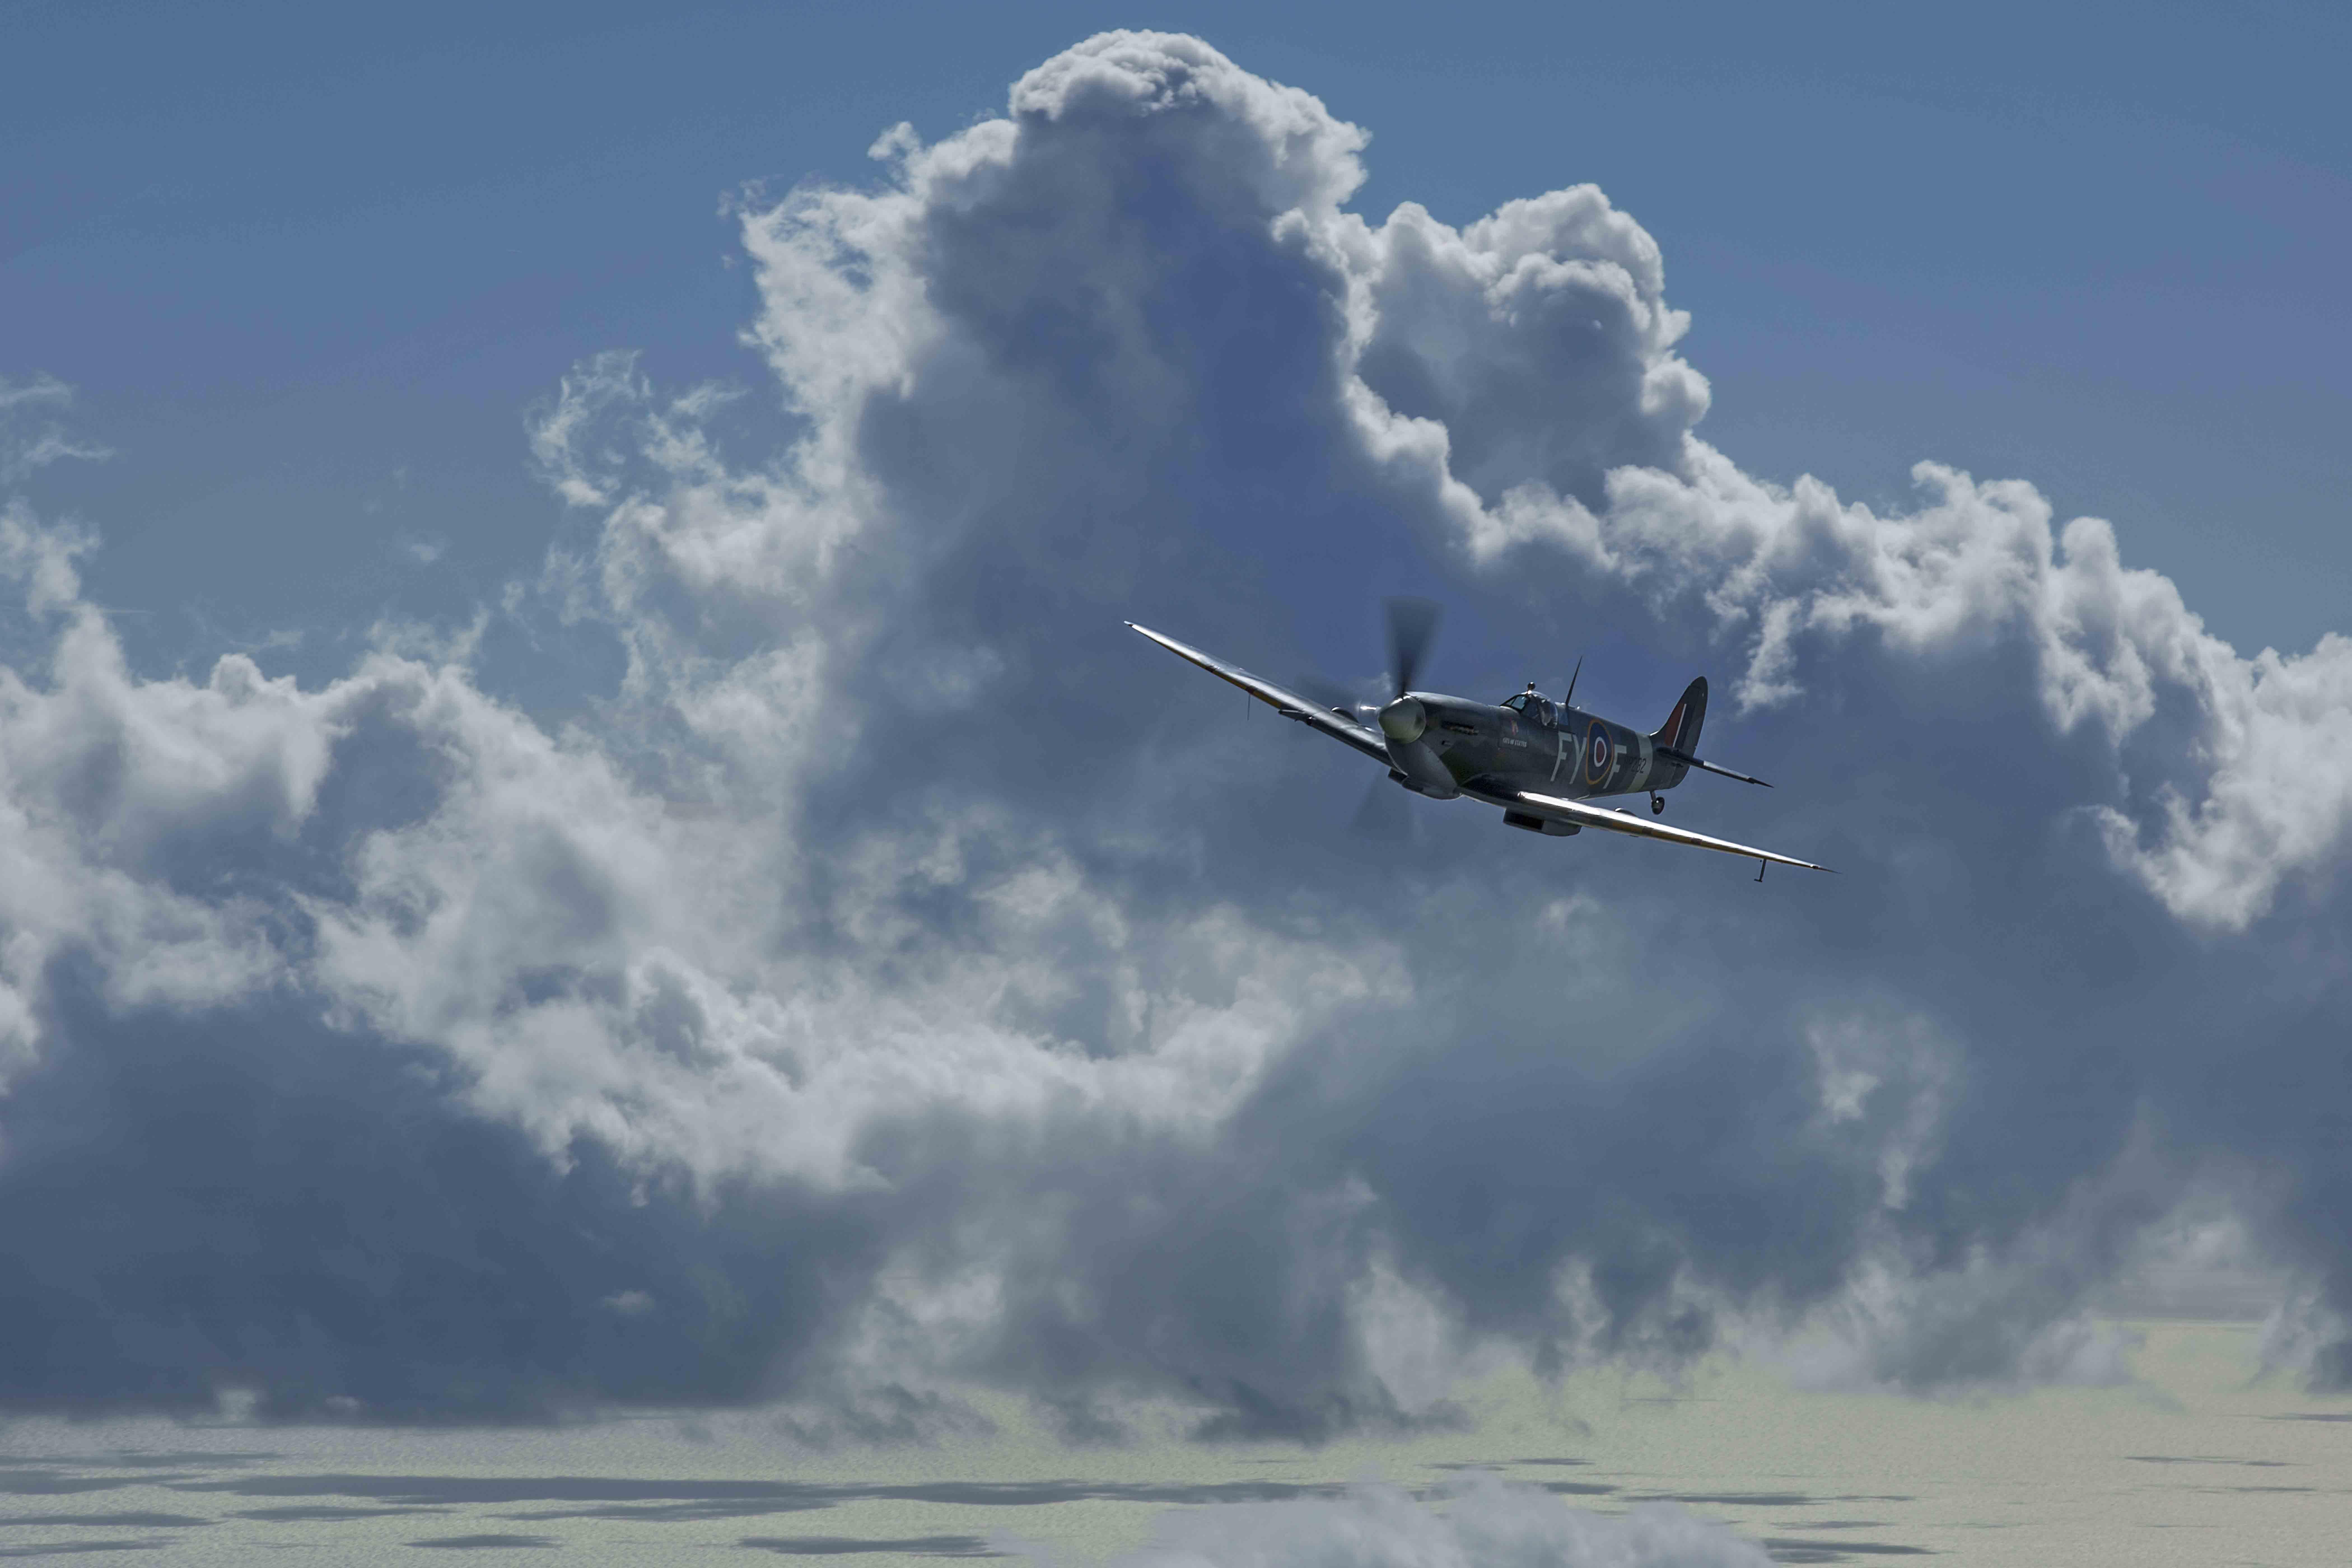 Spitfire Flight Experiences from Goodwood Aerodrome, UK